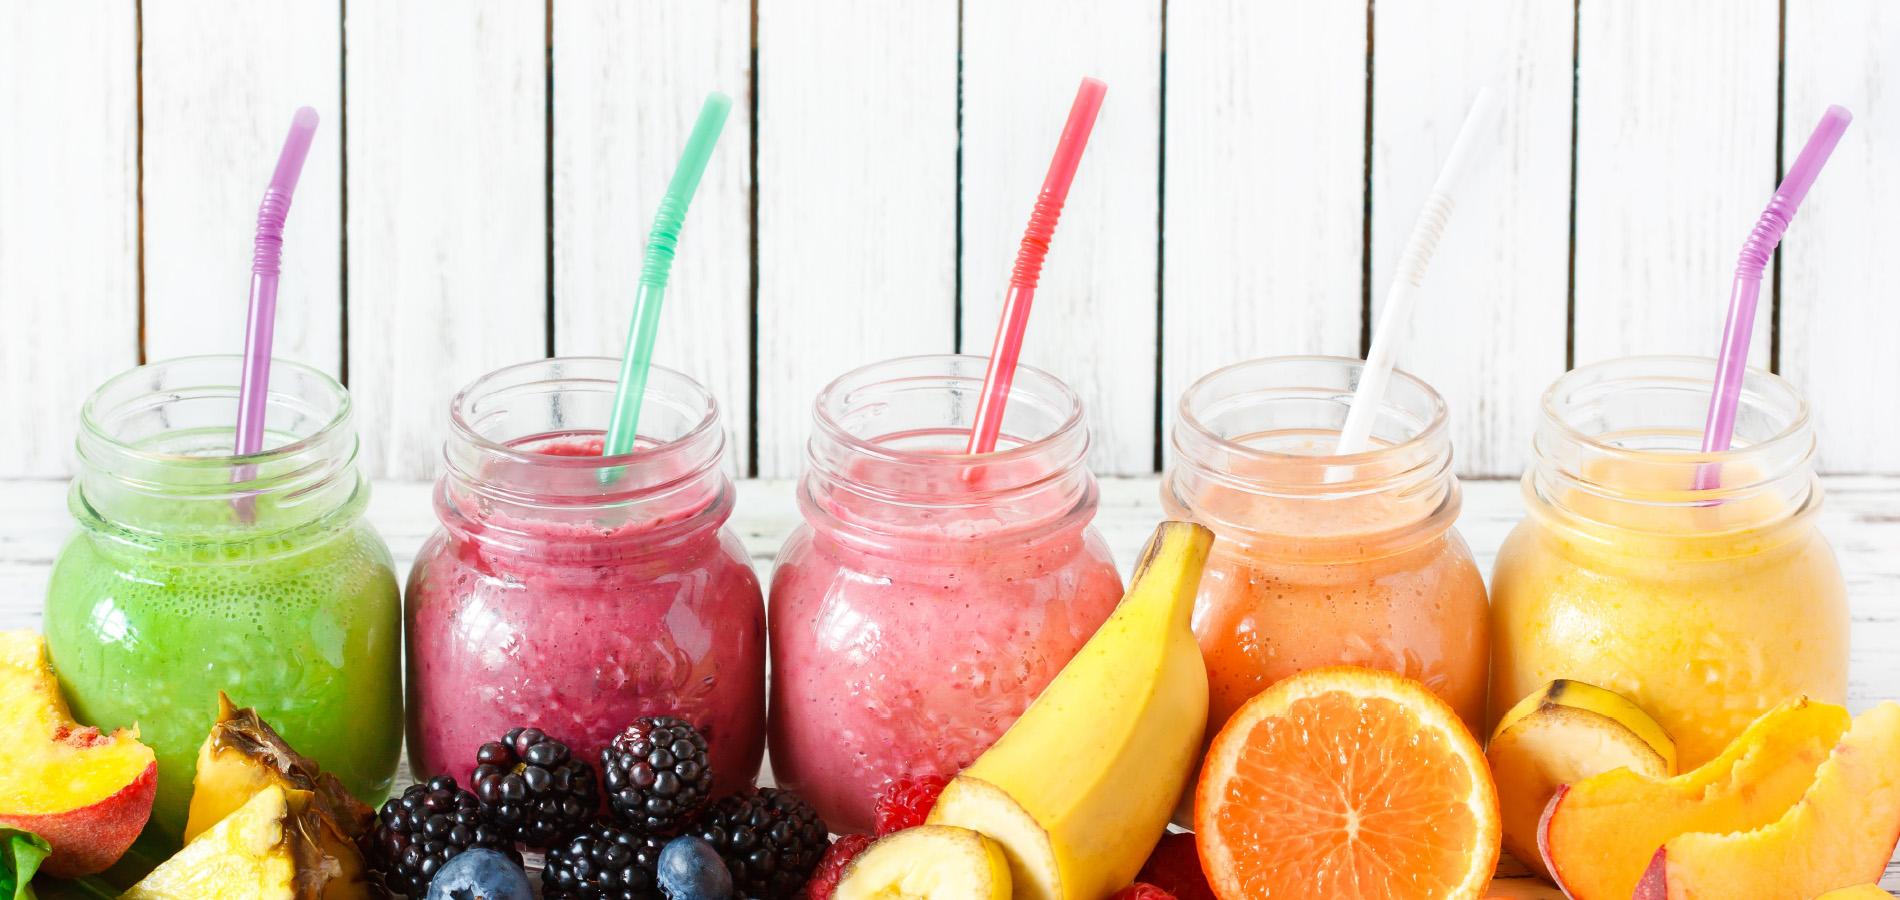 Frisdranken, fruitsappen, smoothies